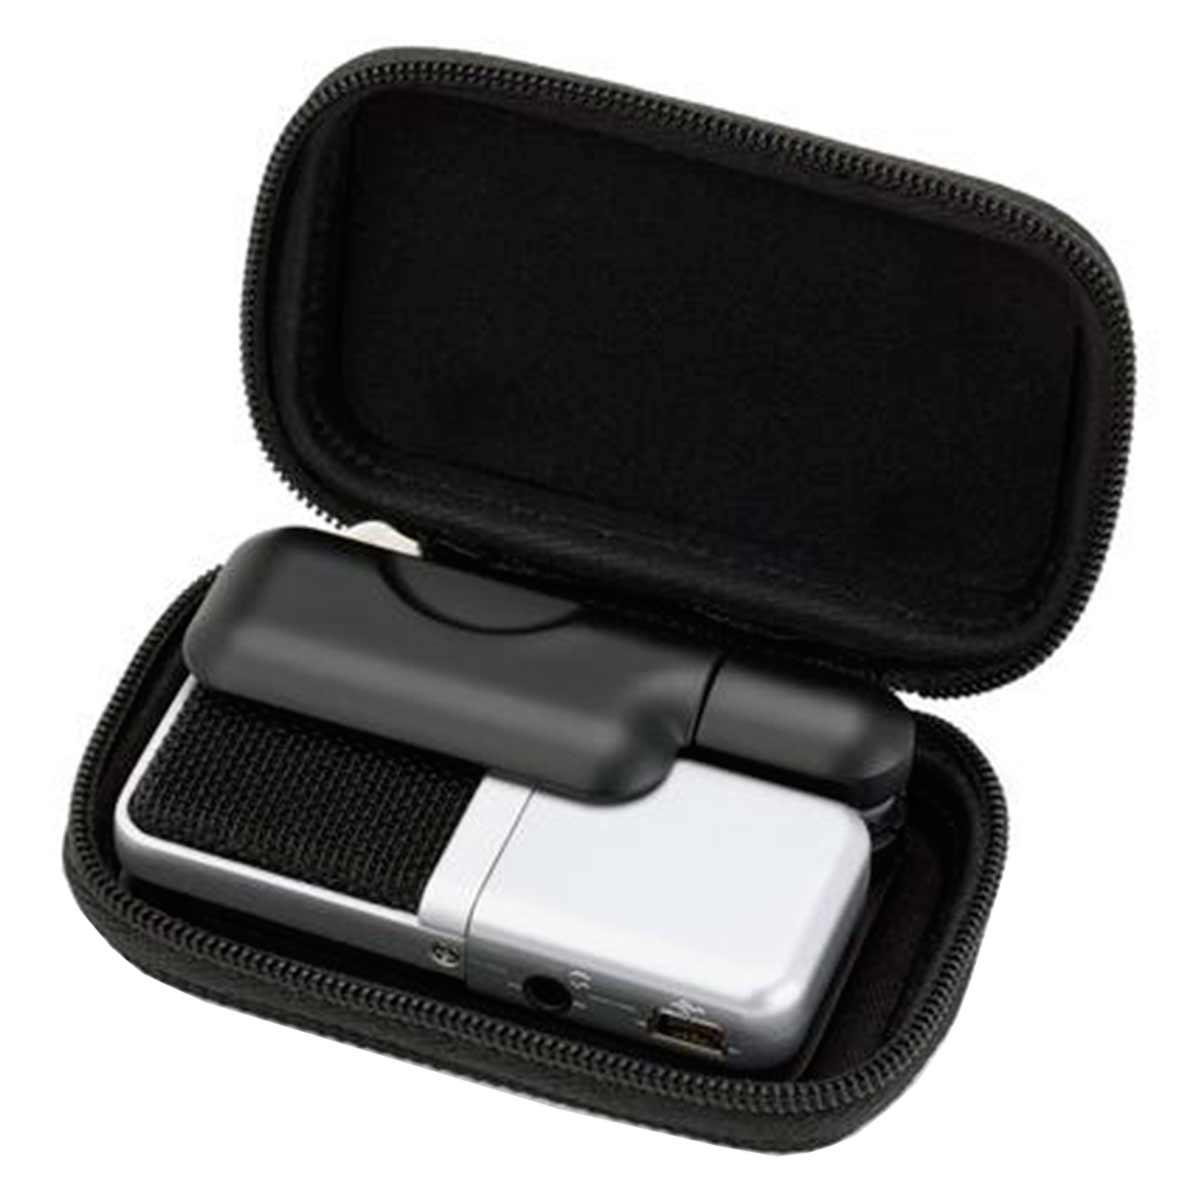 GOMIC - Microfone USB GO MIC - Samson